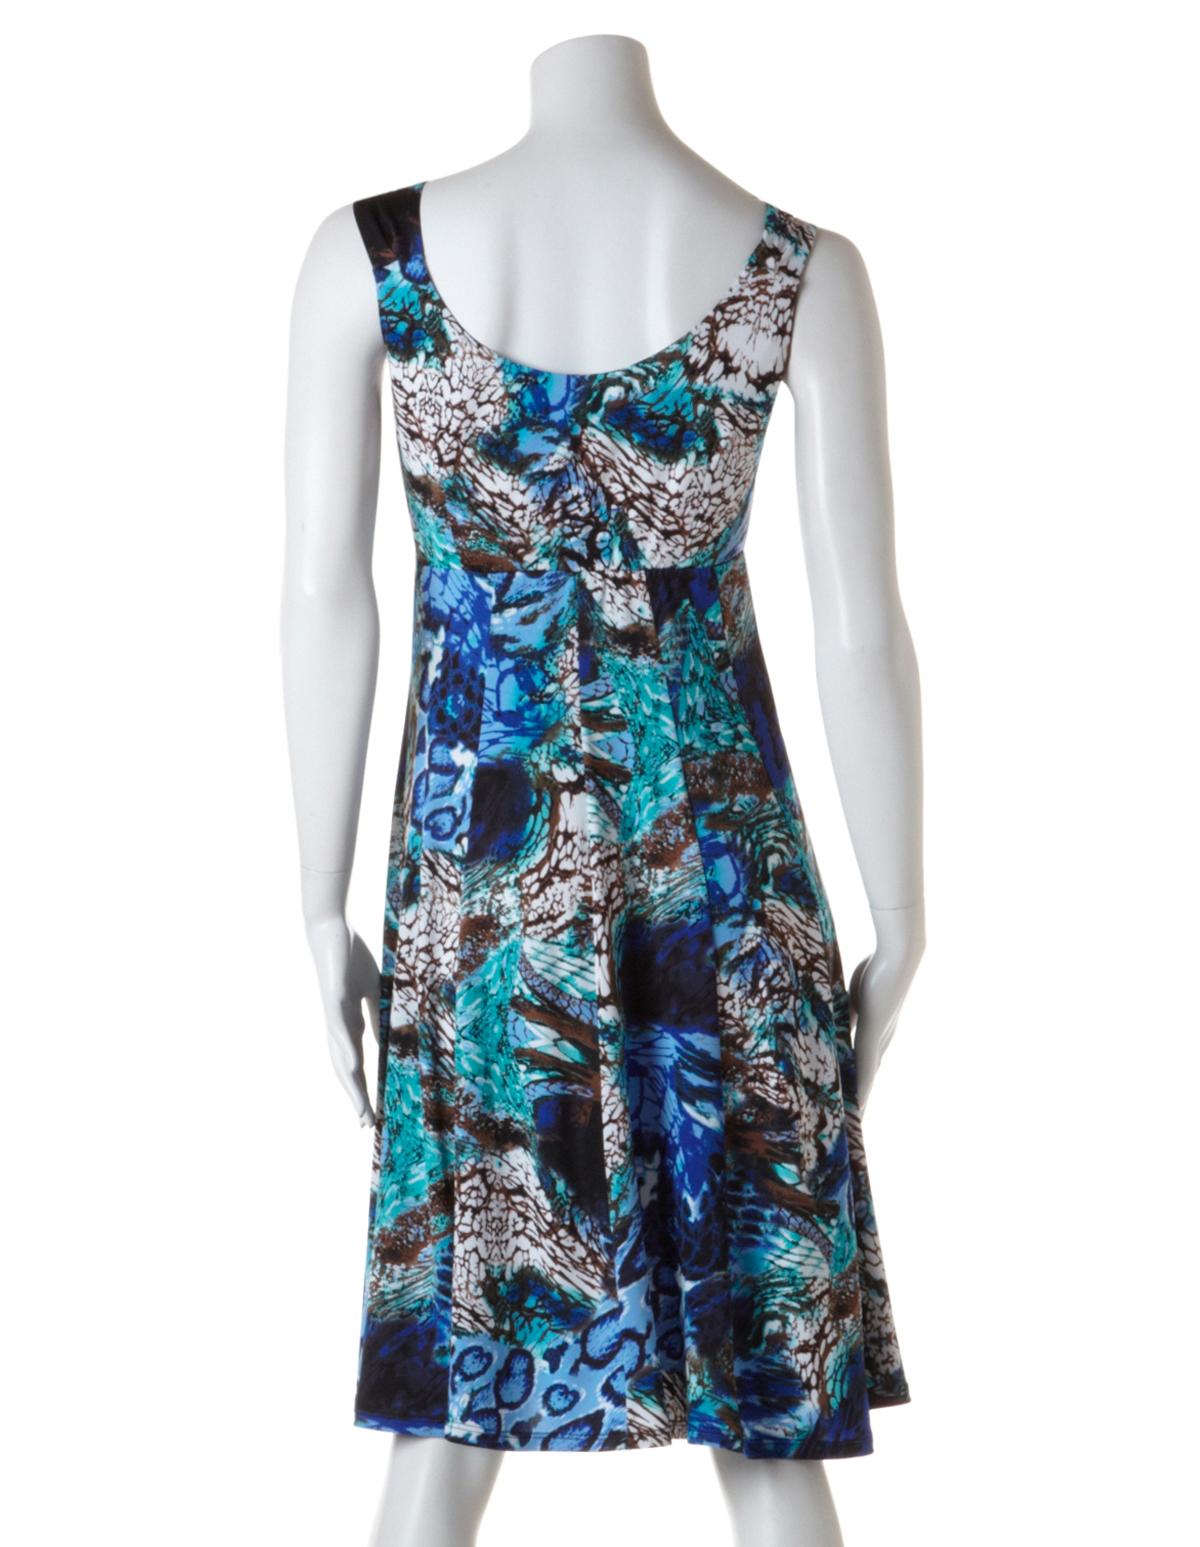 b1701e7e394 ... Mixed Animal Print Fit and Flare Dress